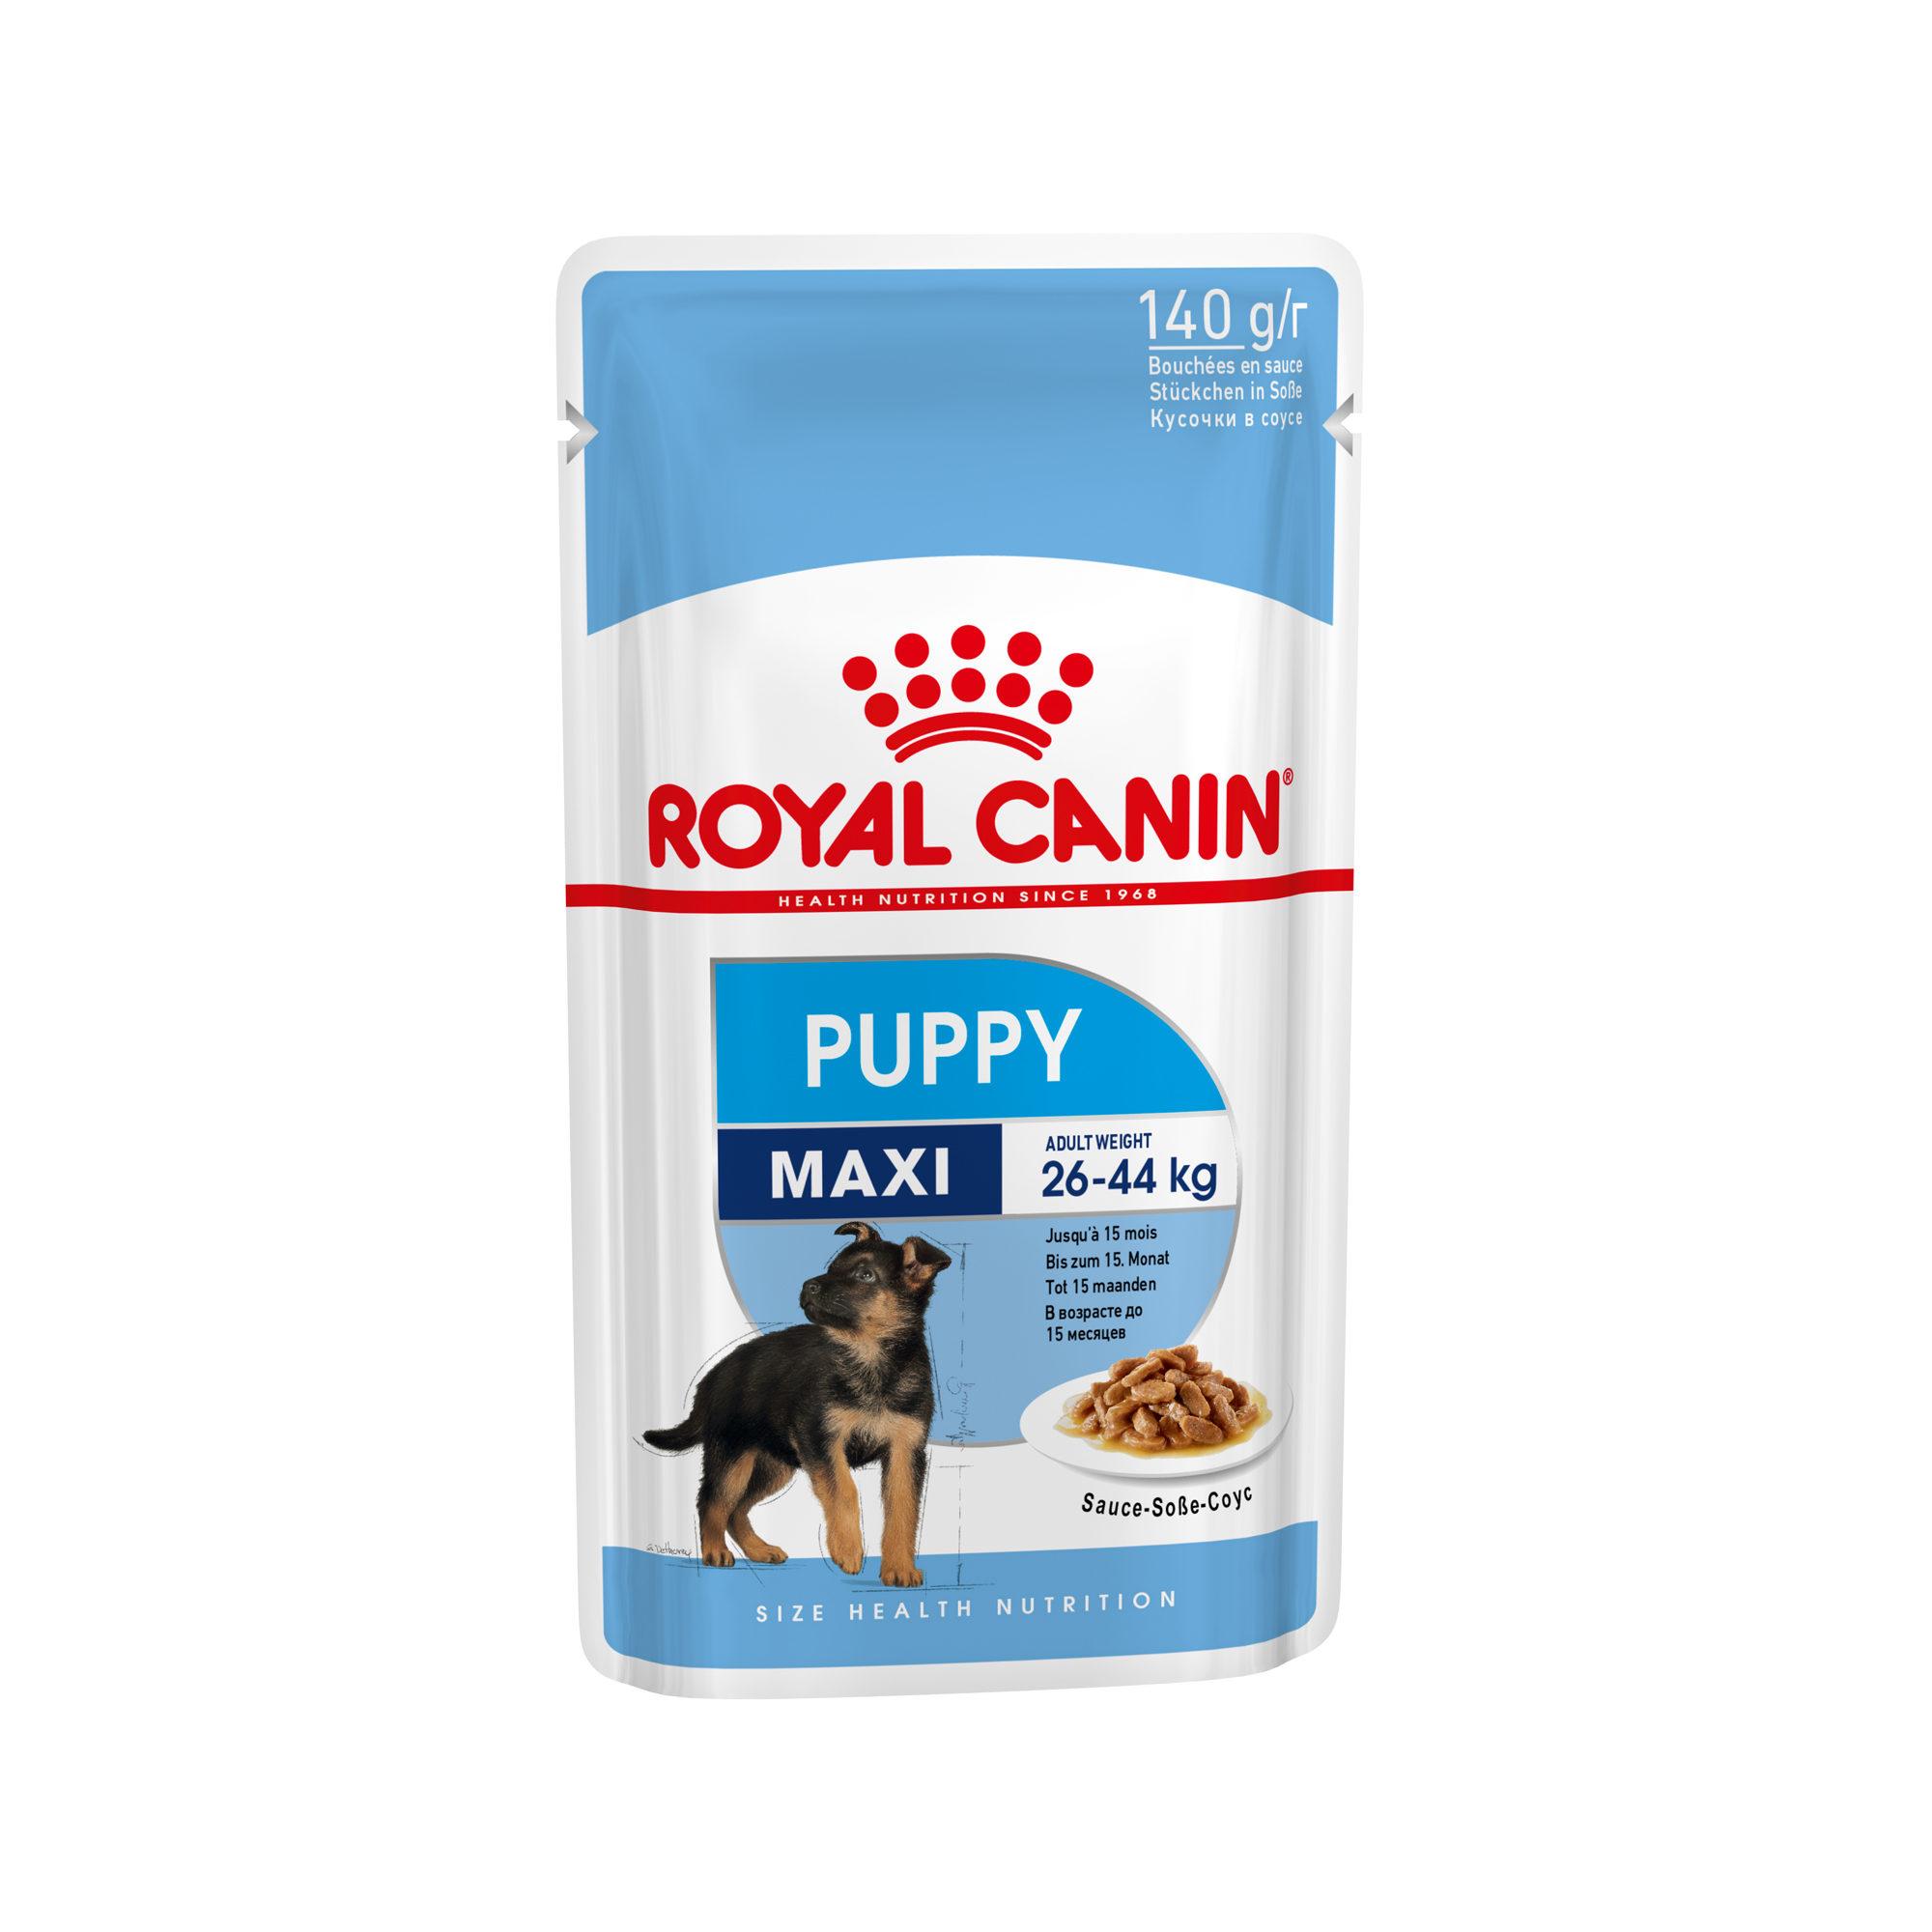 Royal Canin Maxi Puppy - Sachet